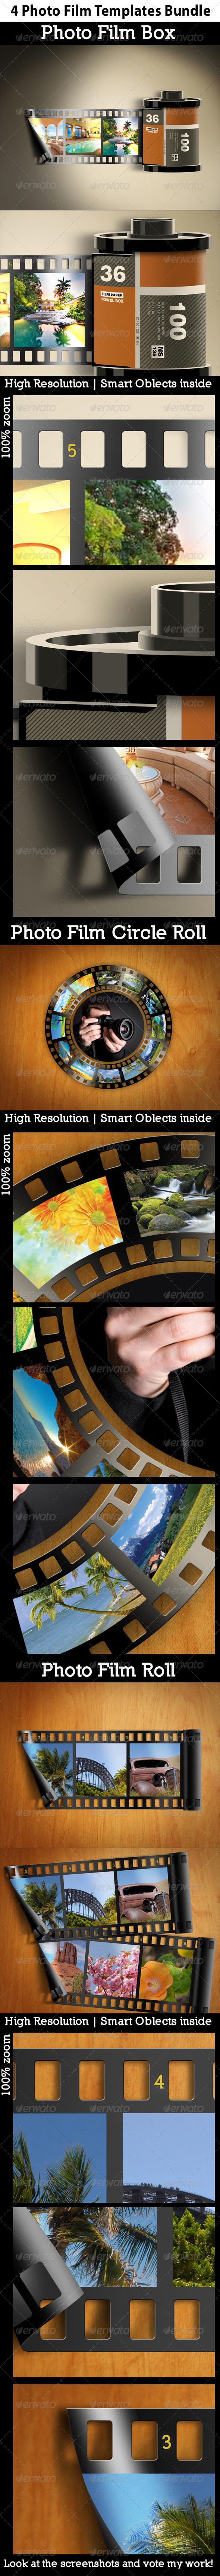 GraphicRiver Photo Film Templates Bundle 5254398